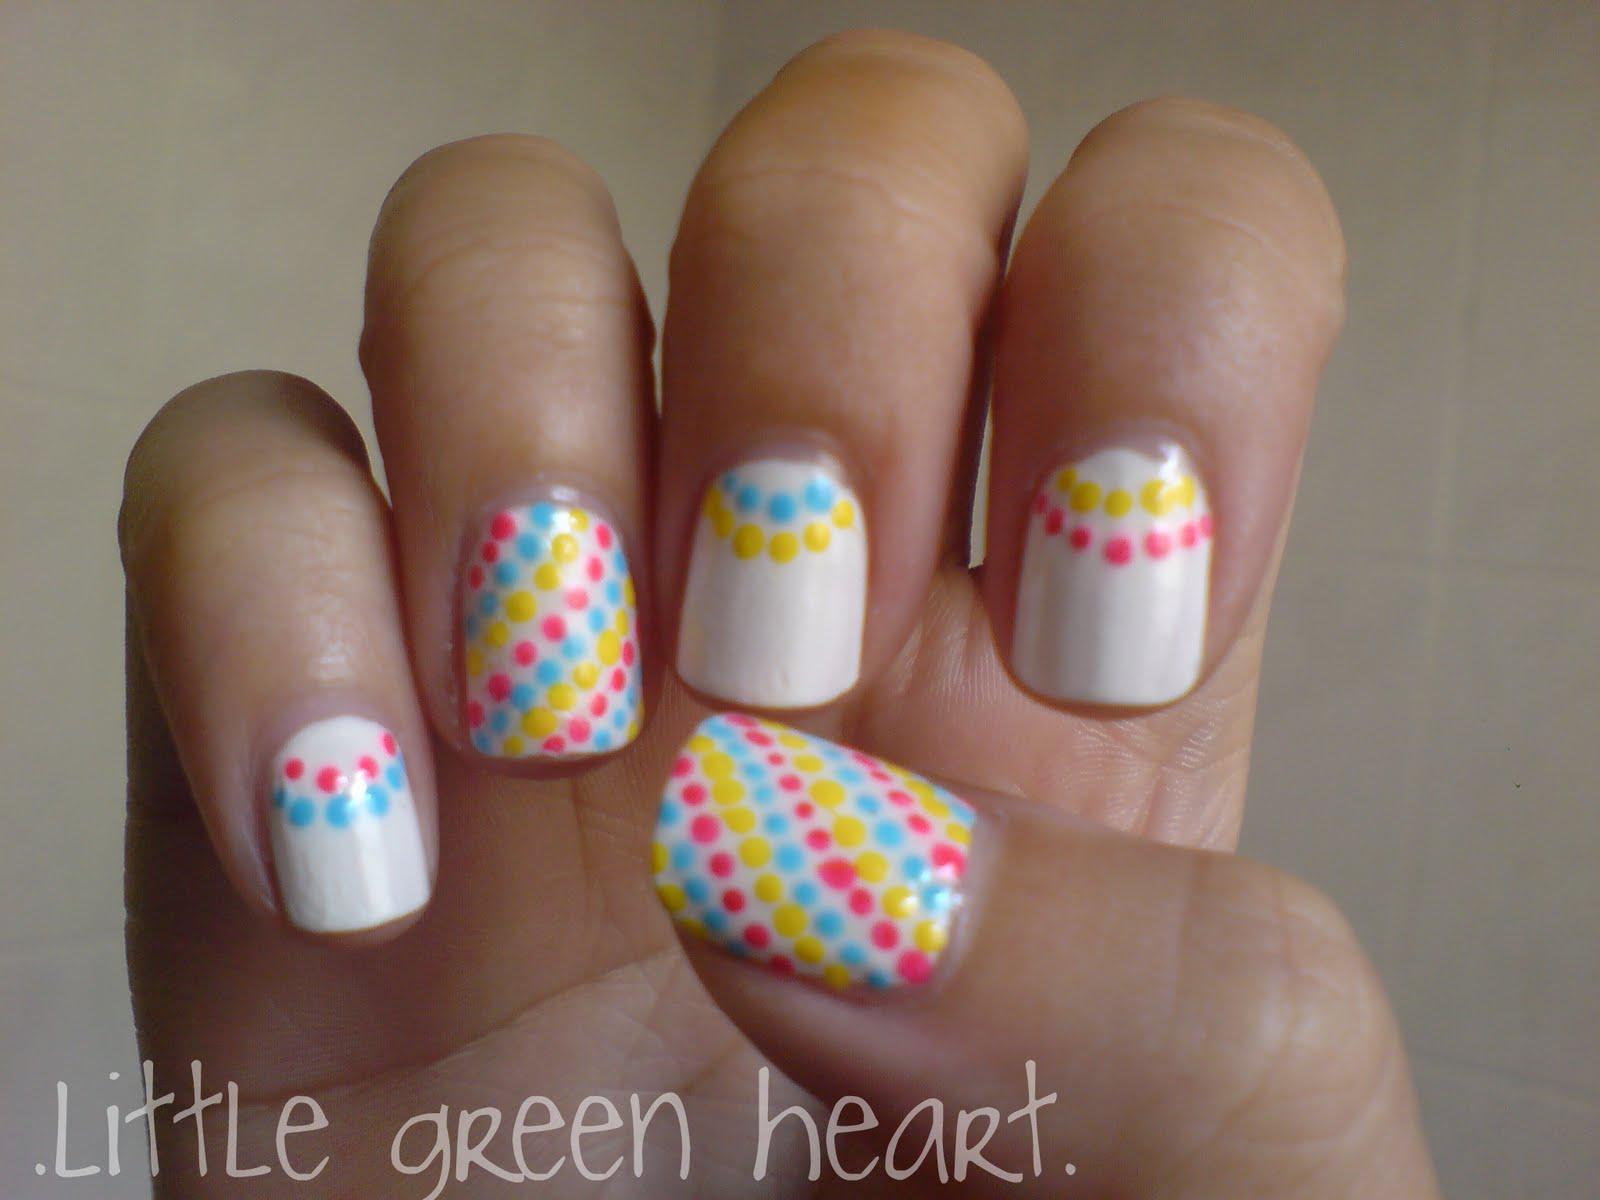 Nail Art Idea Cute Nail Art Designs To Do At Home